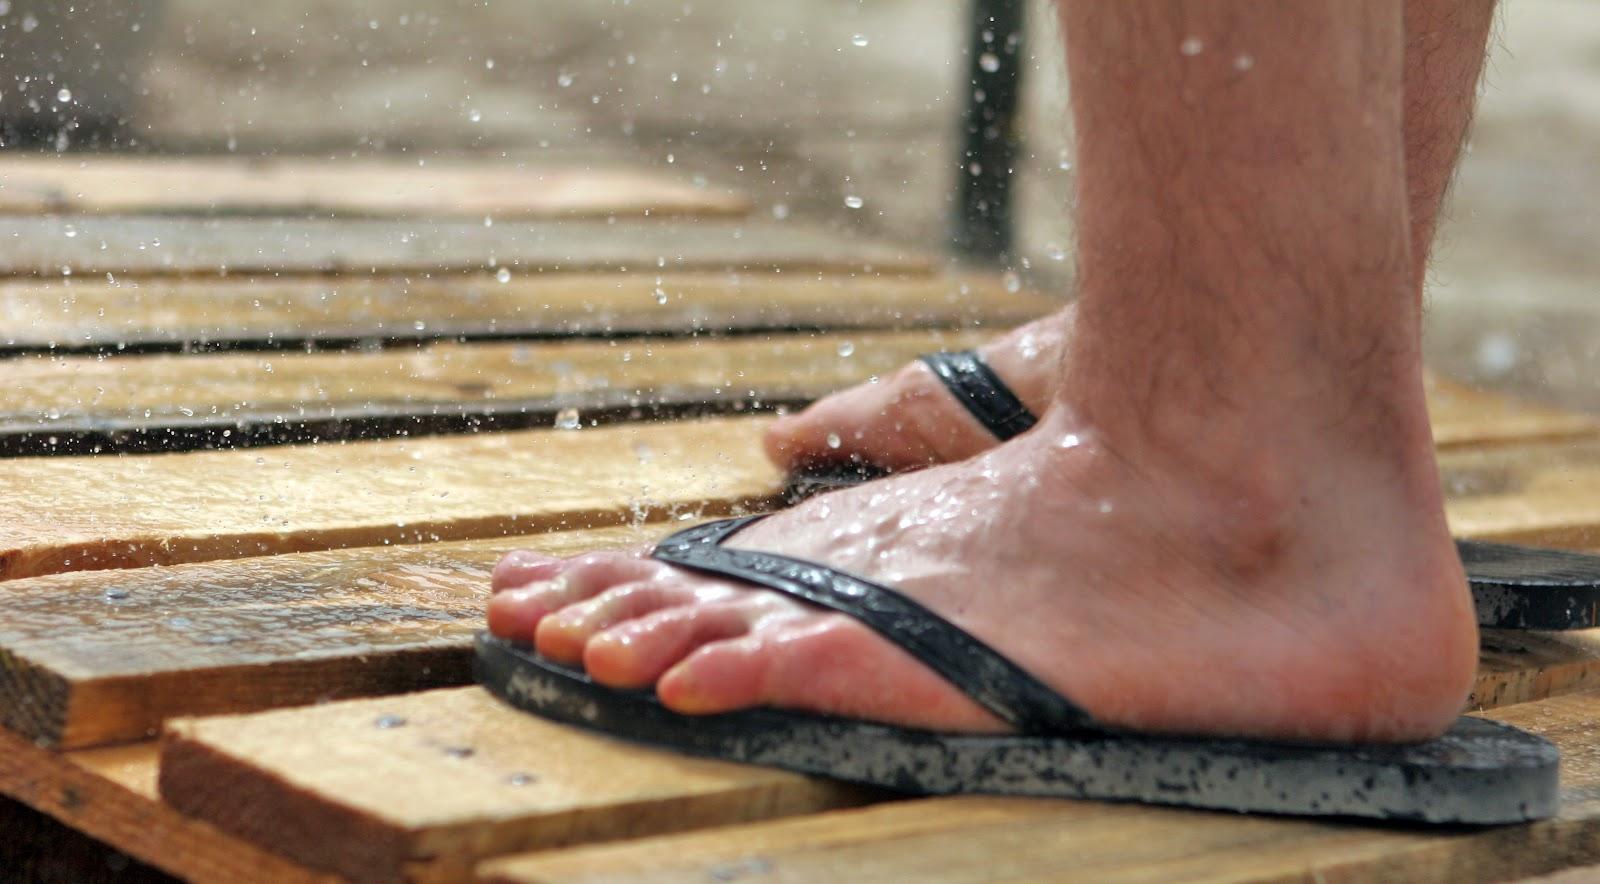 Sandals in the rain